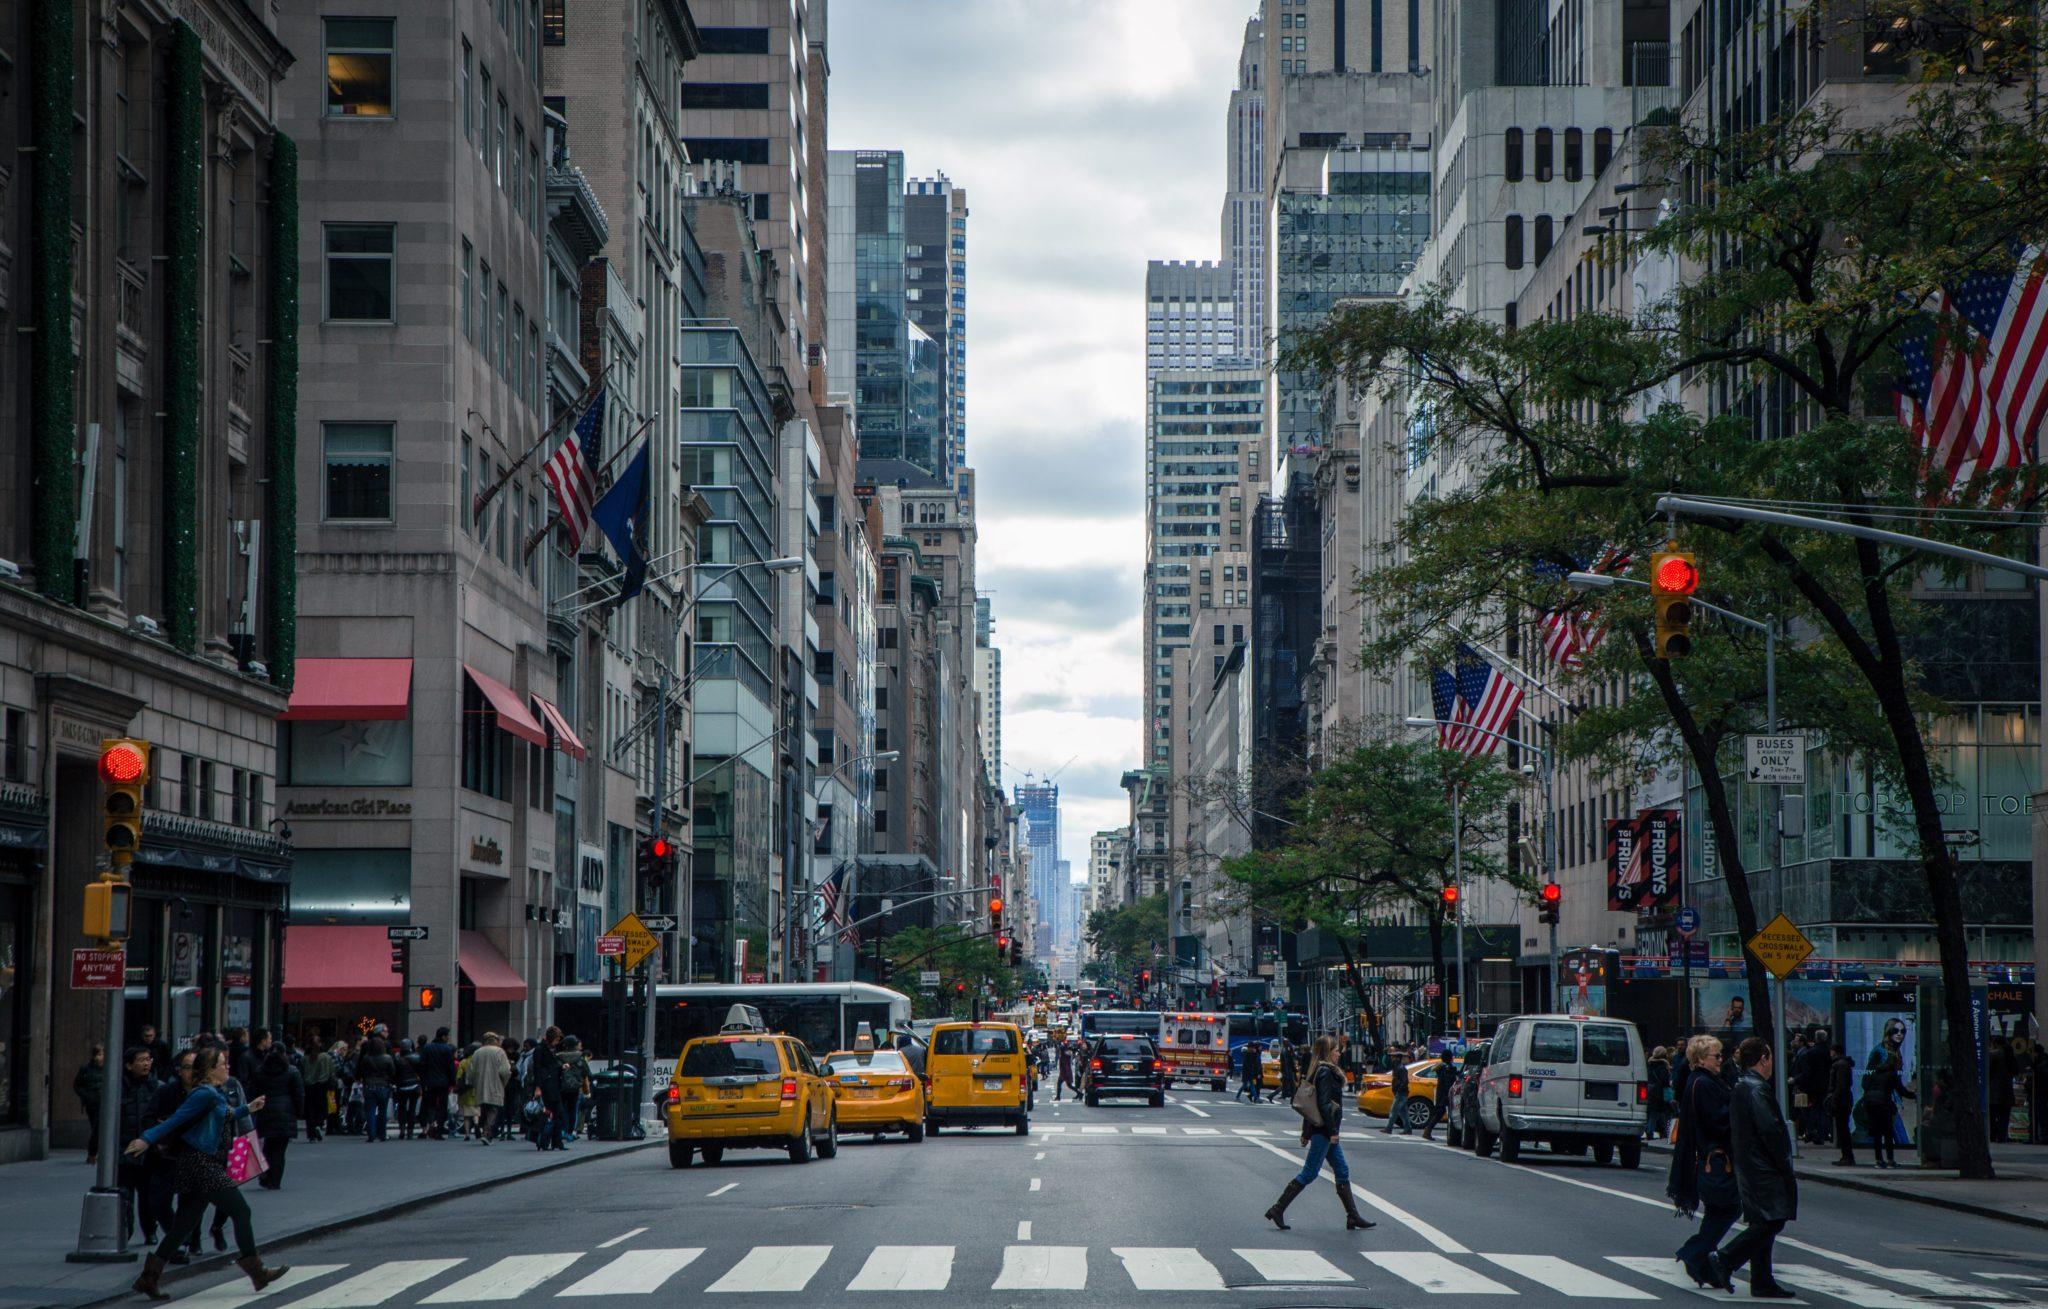 flights to Australia - Top layover destinations New york